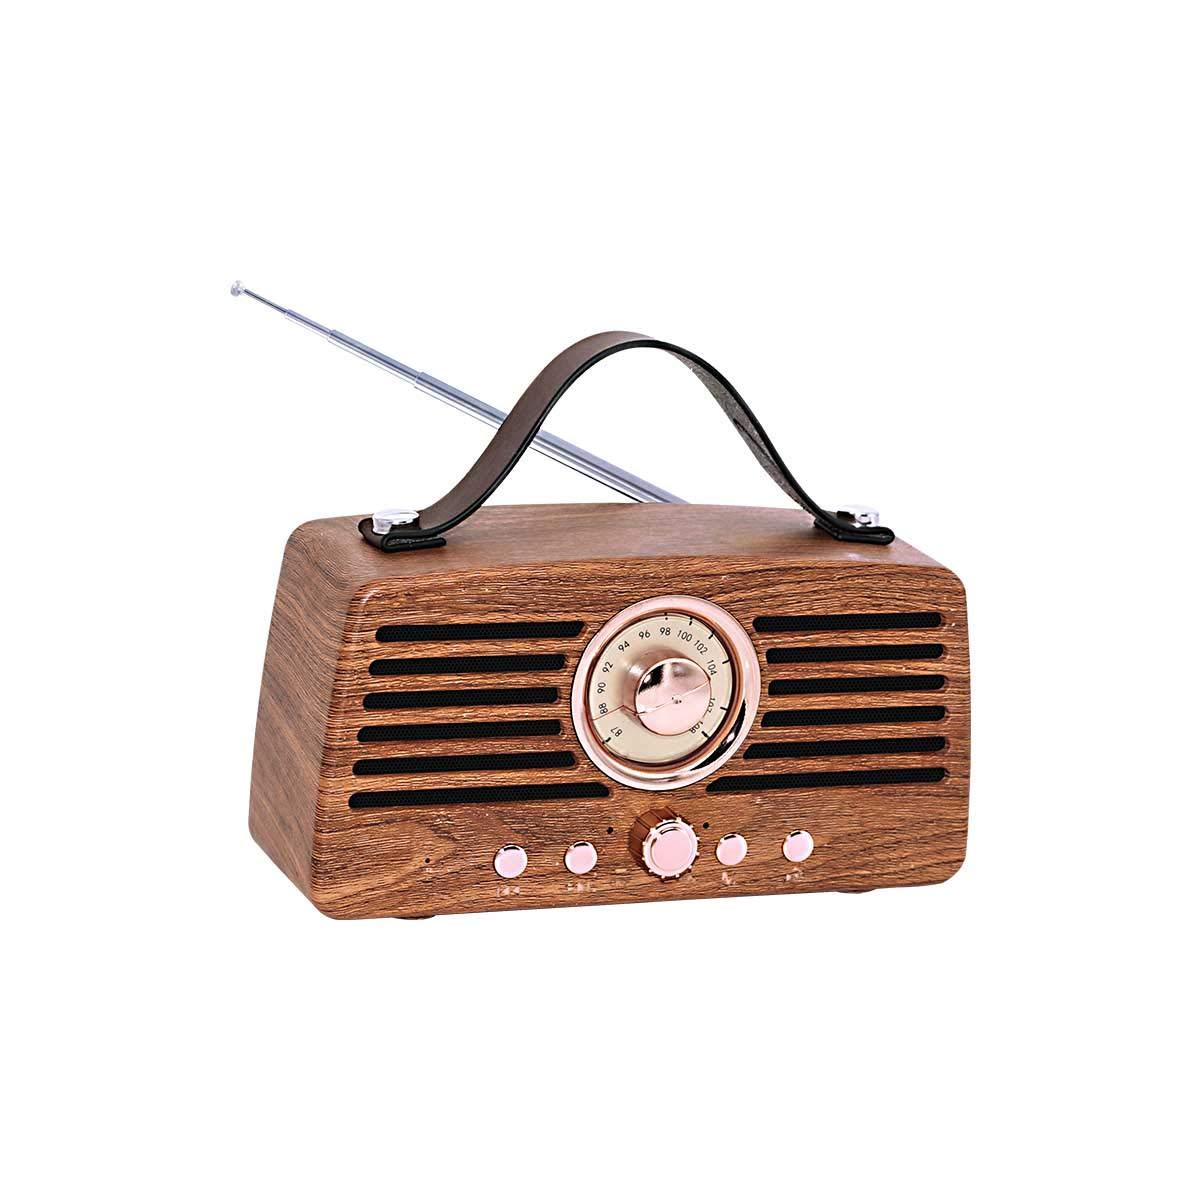 Artis BT45 Retro Portable Wireless Bluetooth Speaker with Analog Control